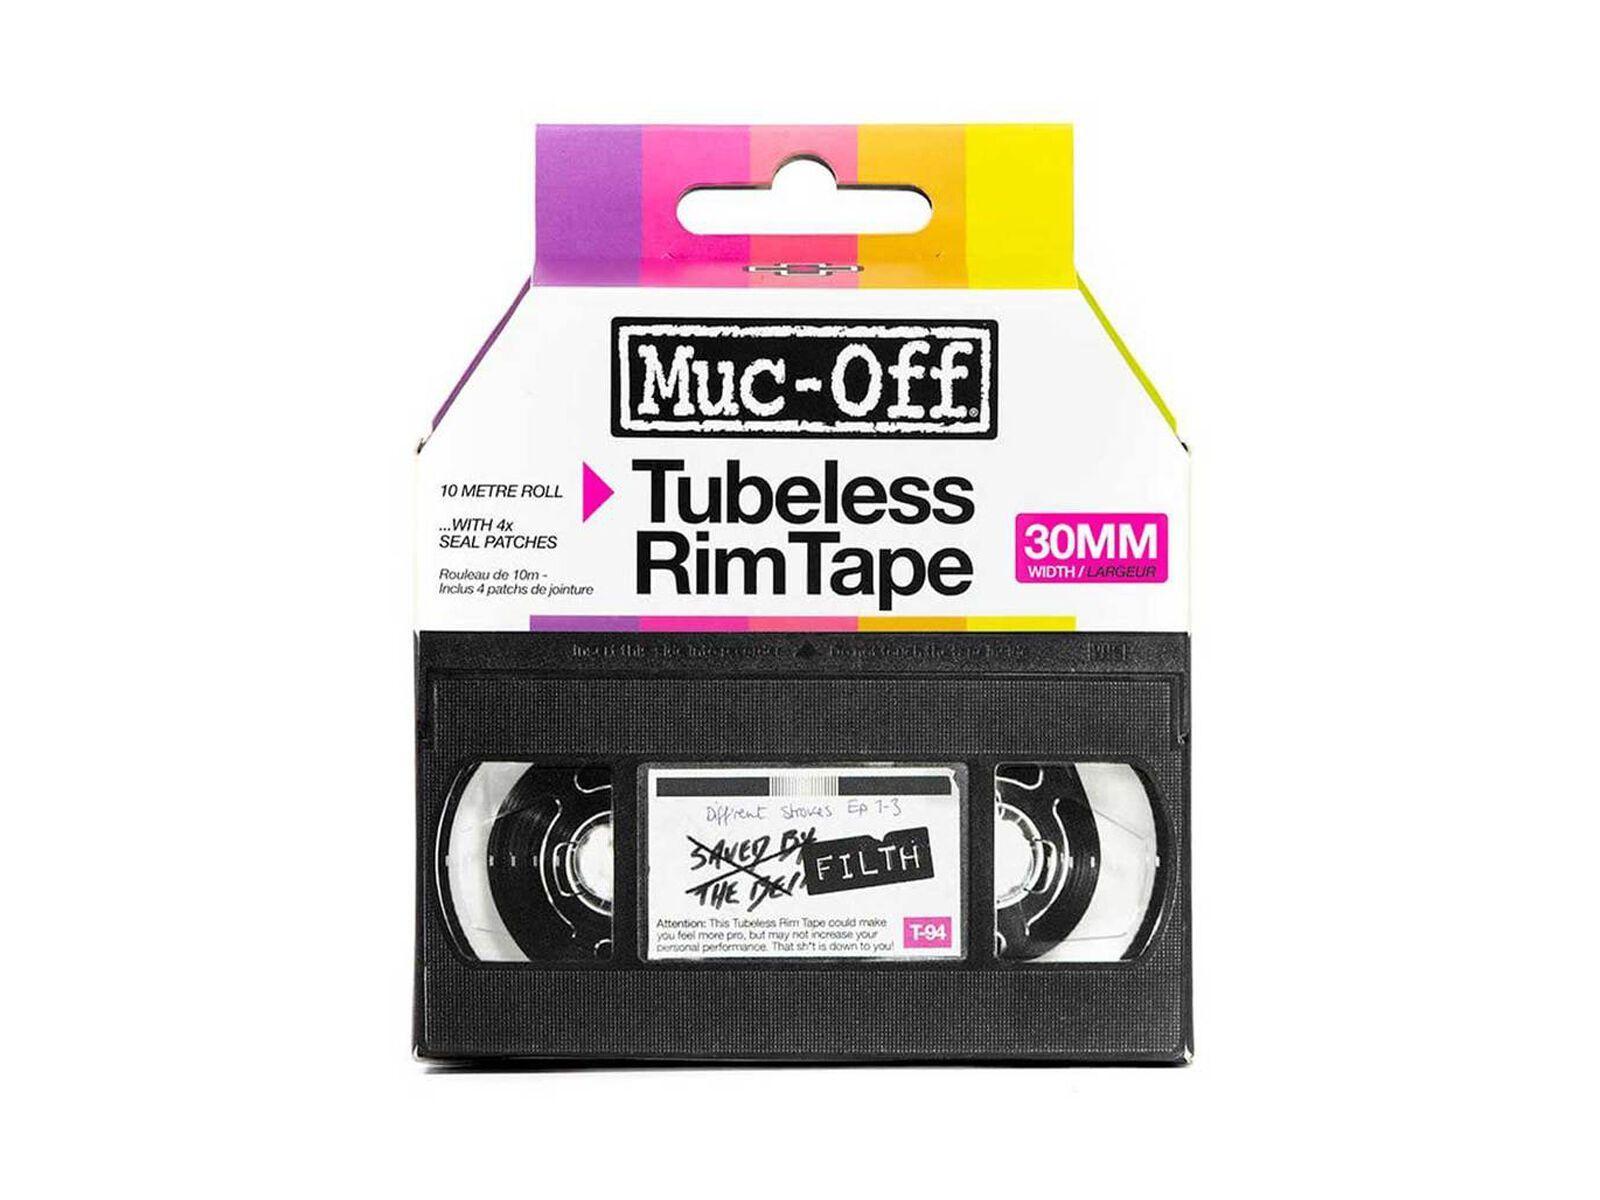 Muc-Off Tubeless Rim Tape - 30 mm - Felgenband MU-TIR-2068/36/30